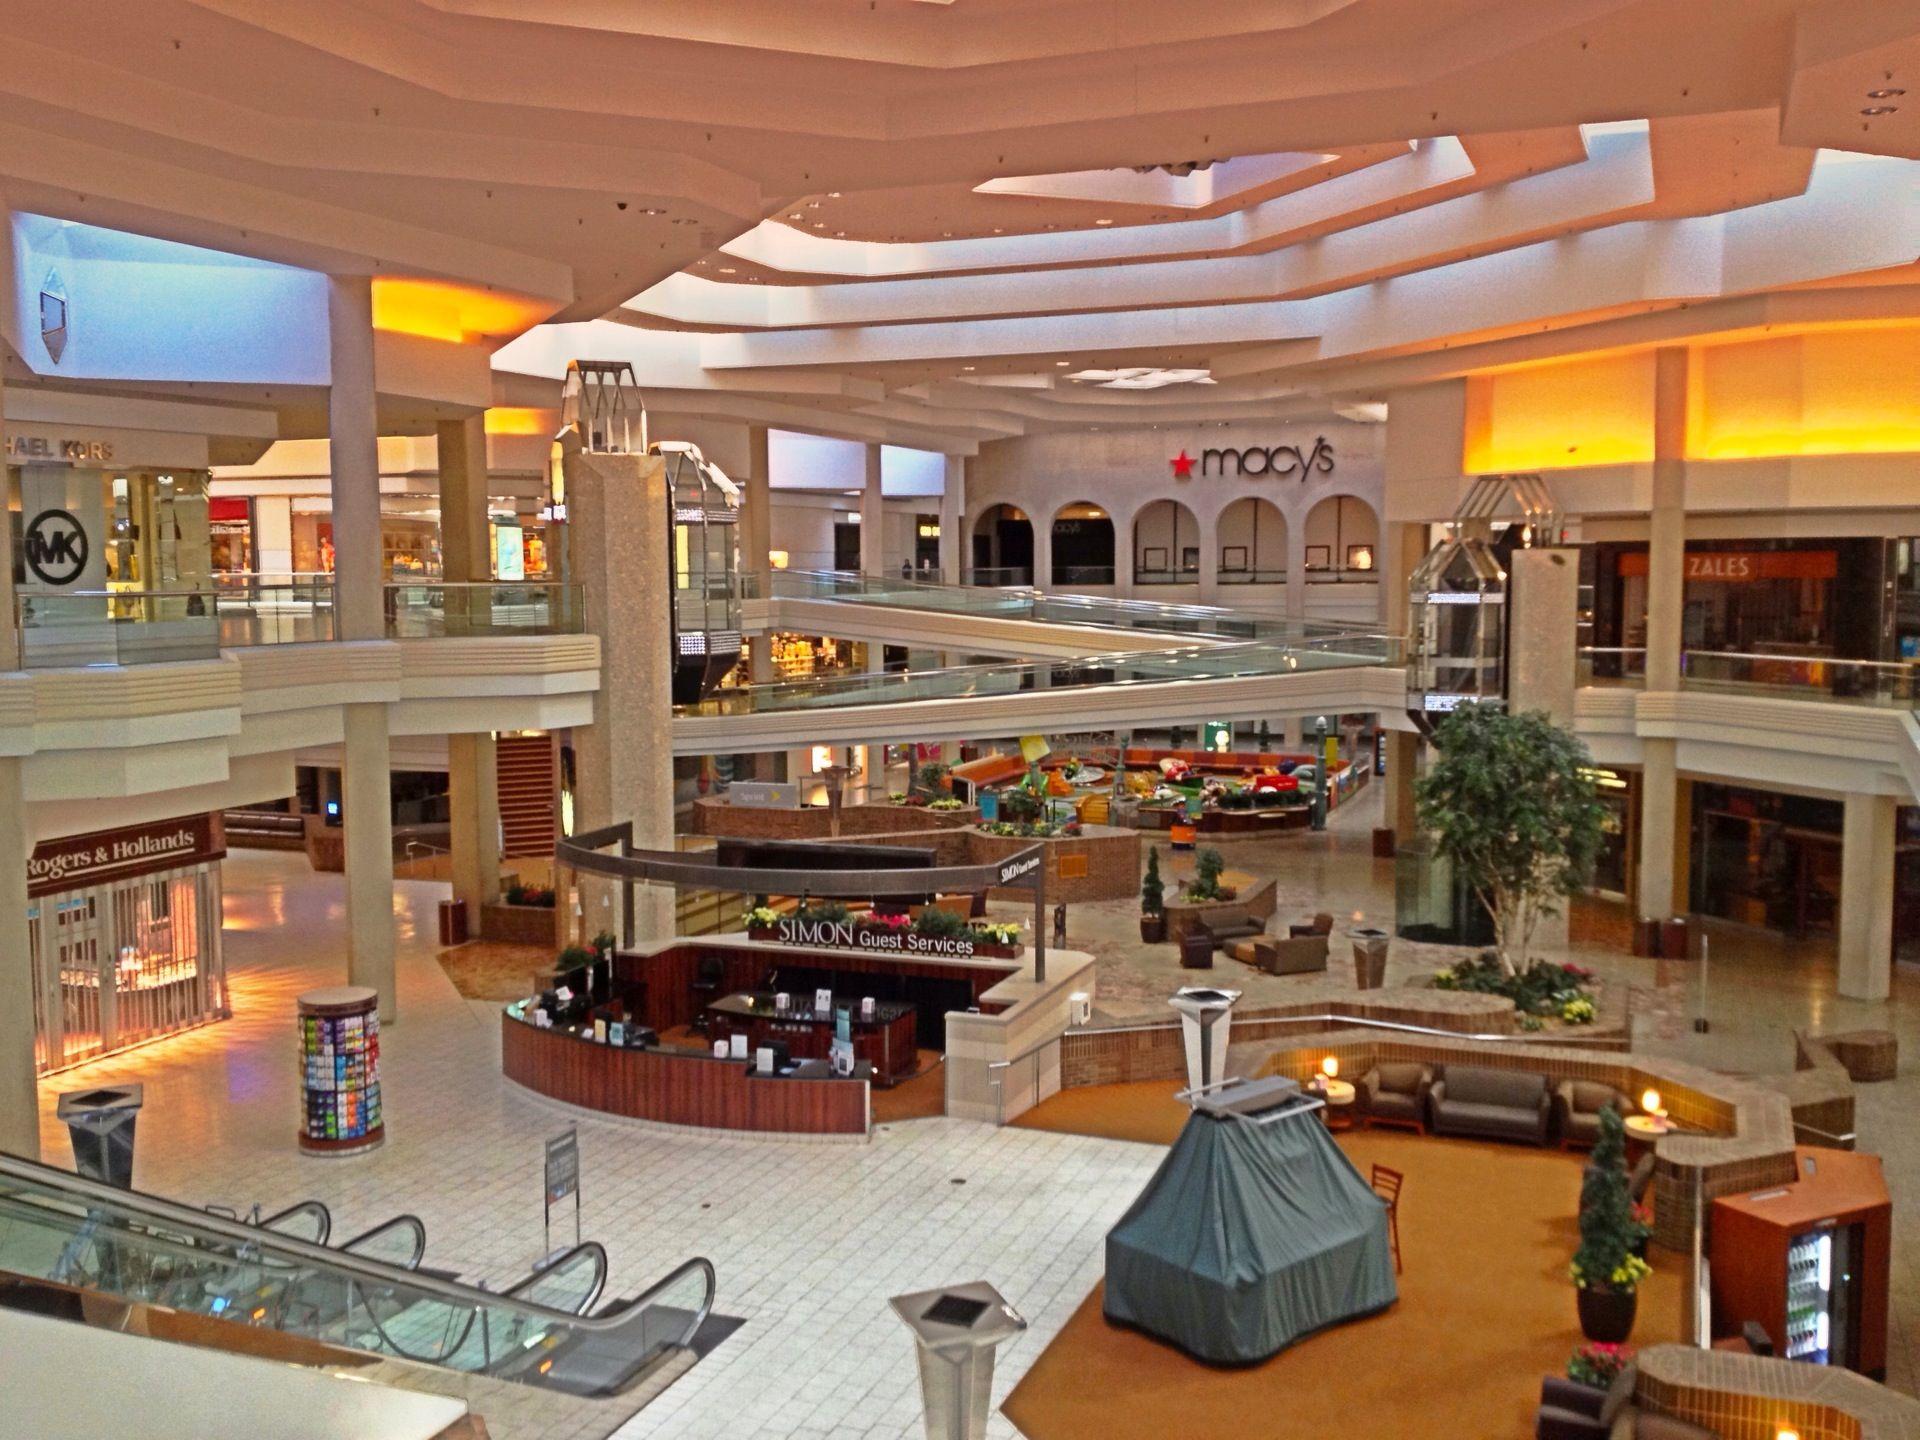 Chicago Woodfield Mall in Schaumburg